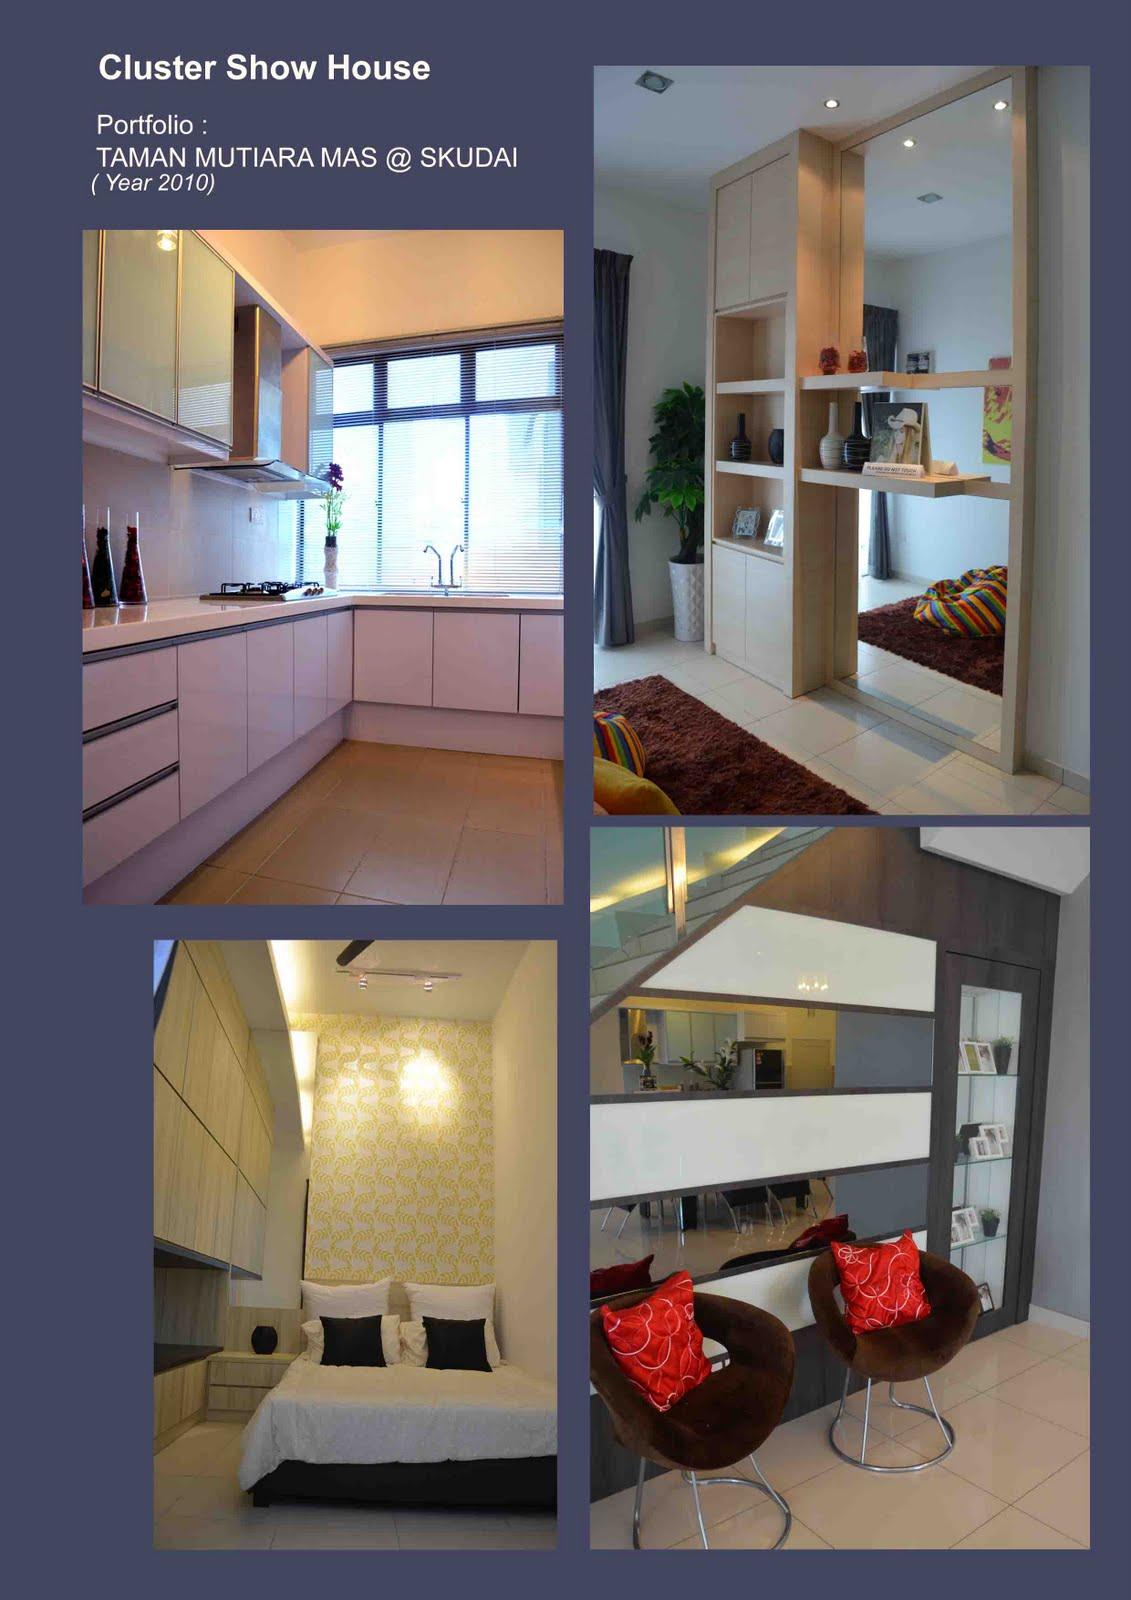 inspiration interior design cluster show house taman mutiara mas skudai. Black Bedroom Furniture Sets. Home Design Ideas